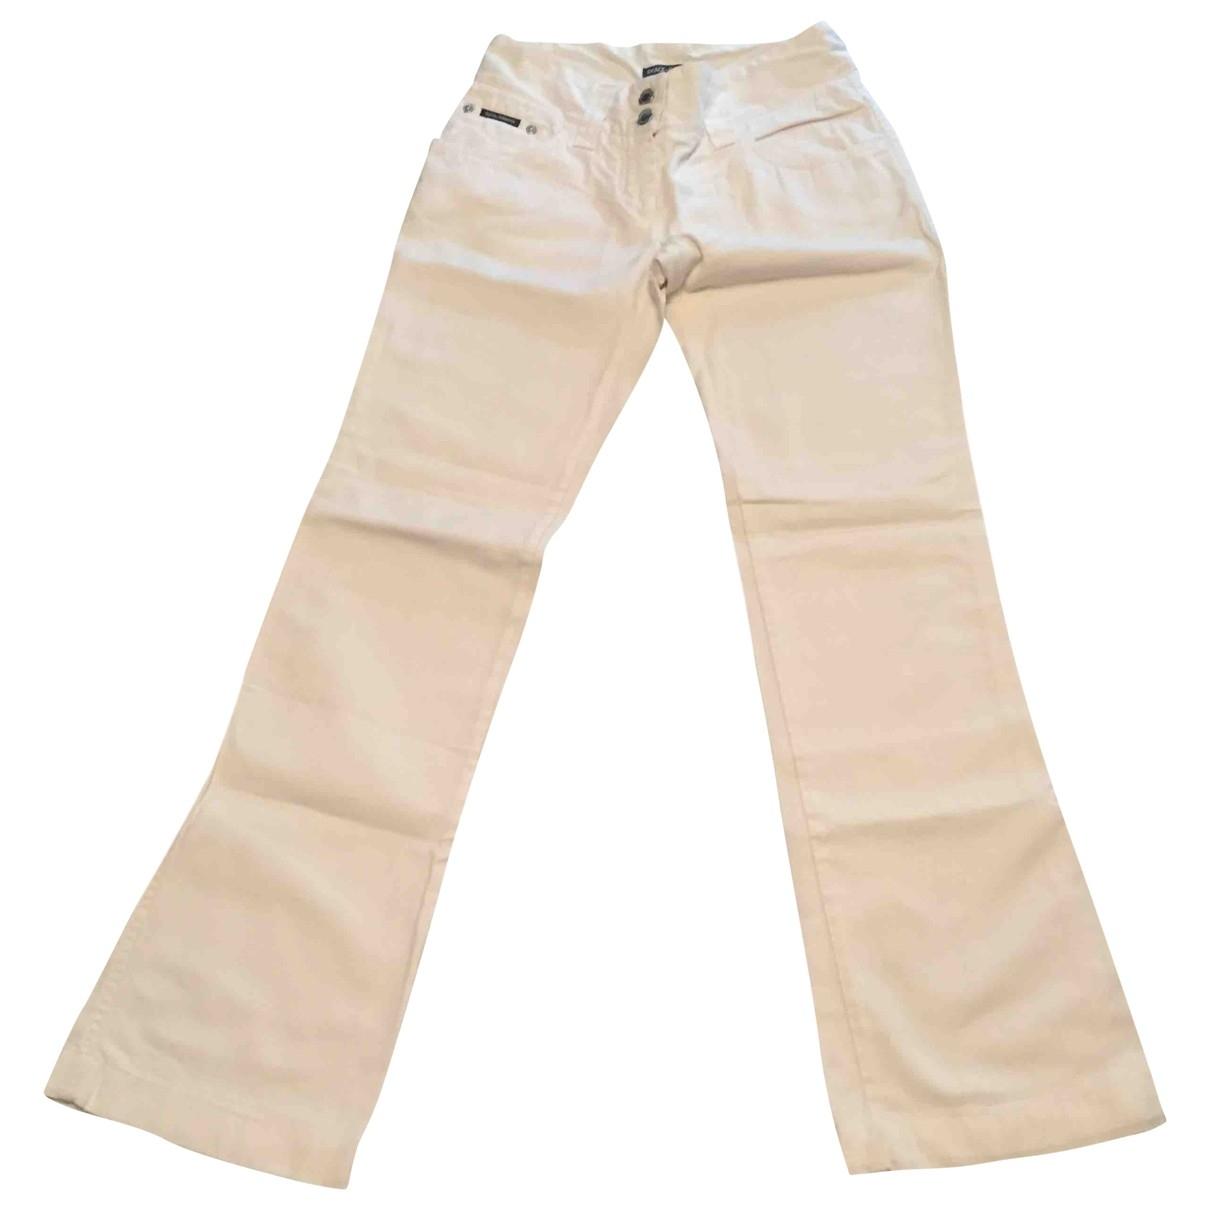 Dolce & Gabbana \N White Denim - Jeans Trousers for Women 42 IT